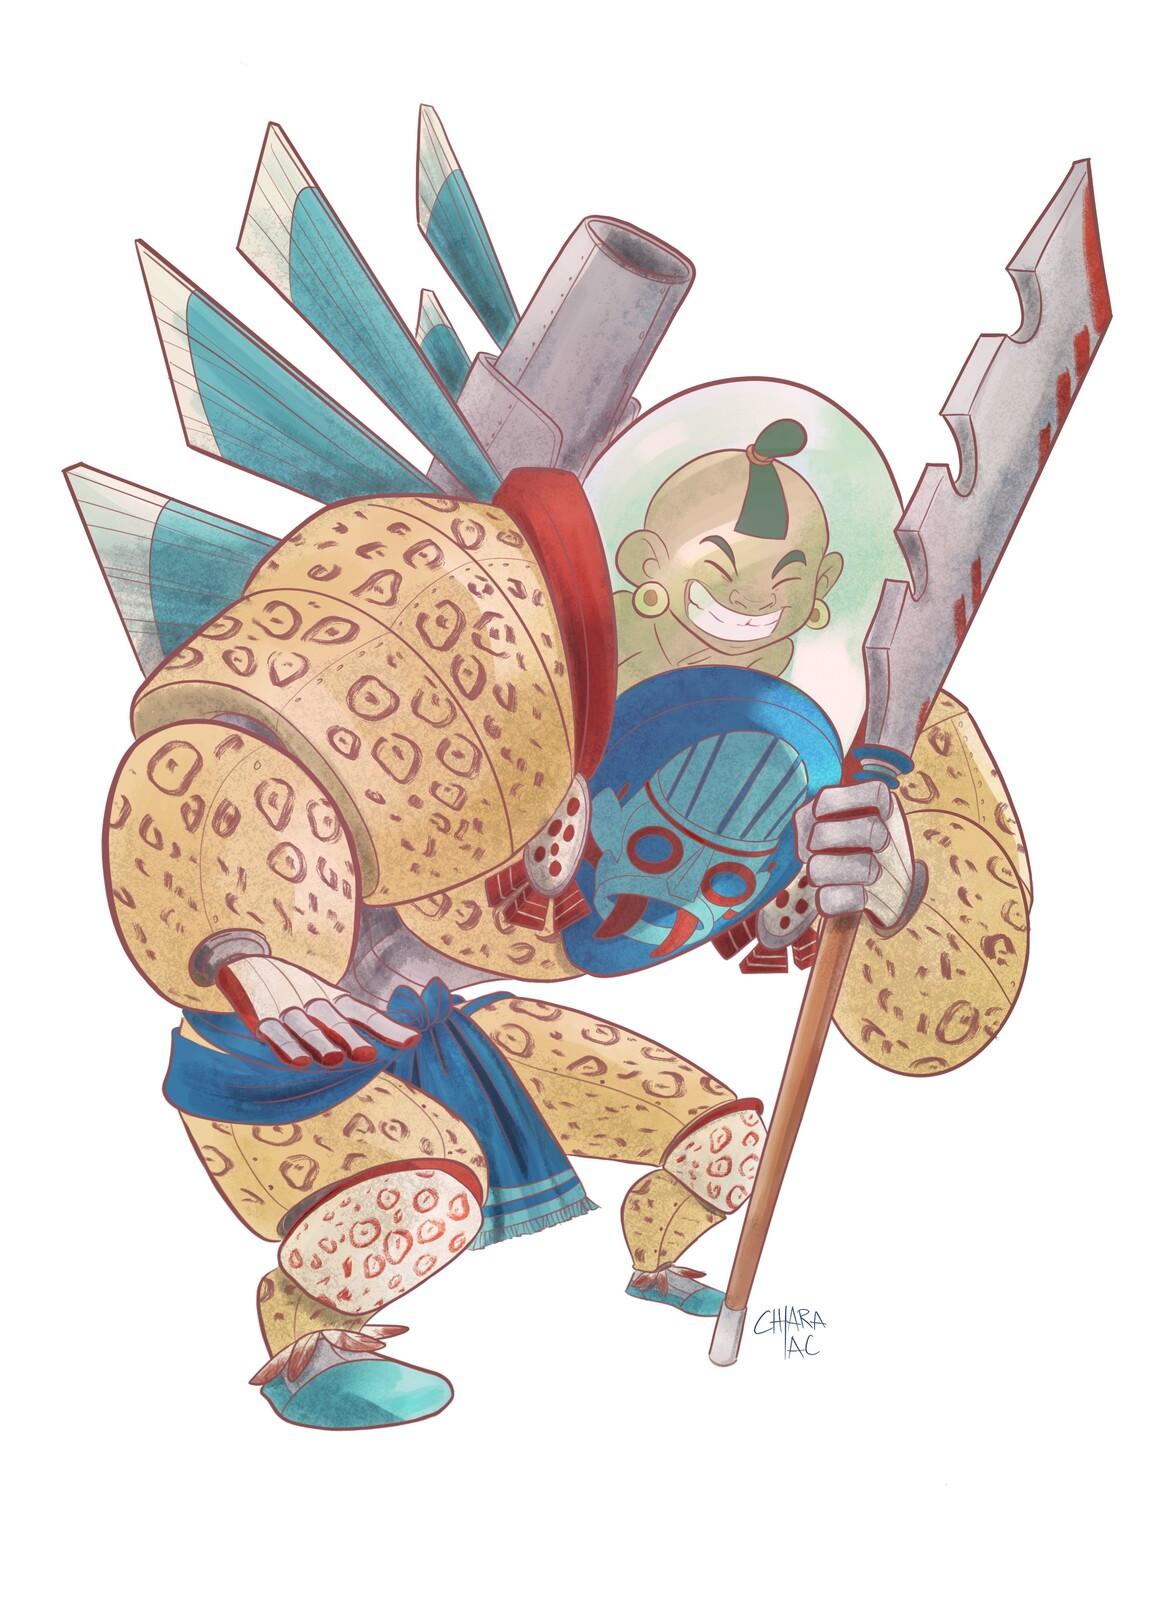 Cdc - Aztec warrior